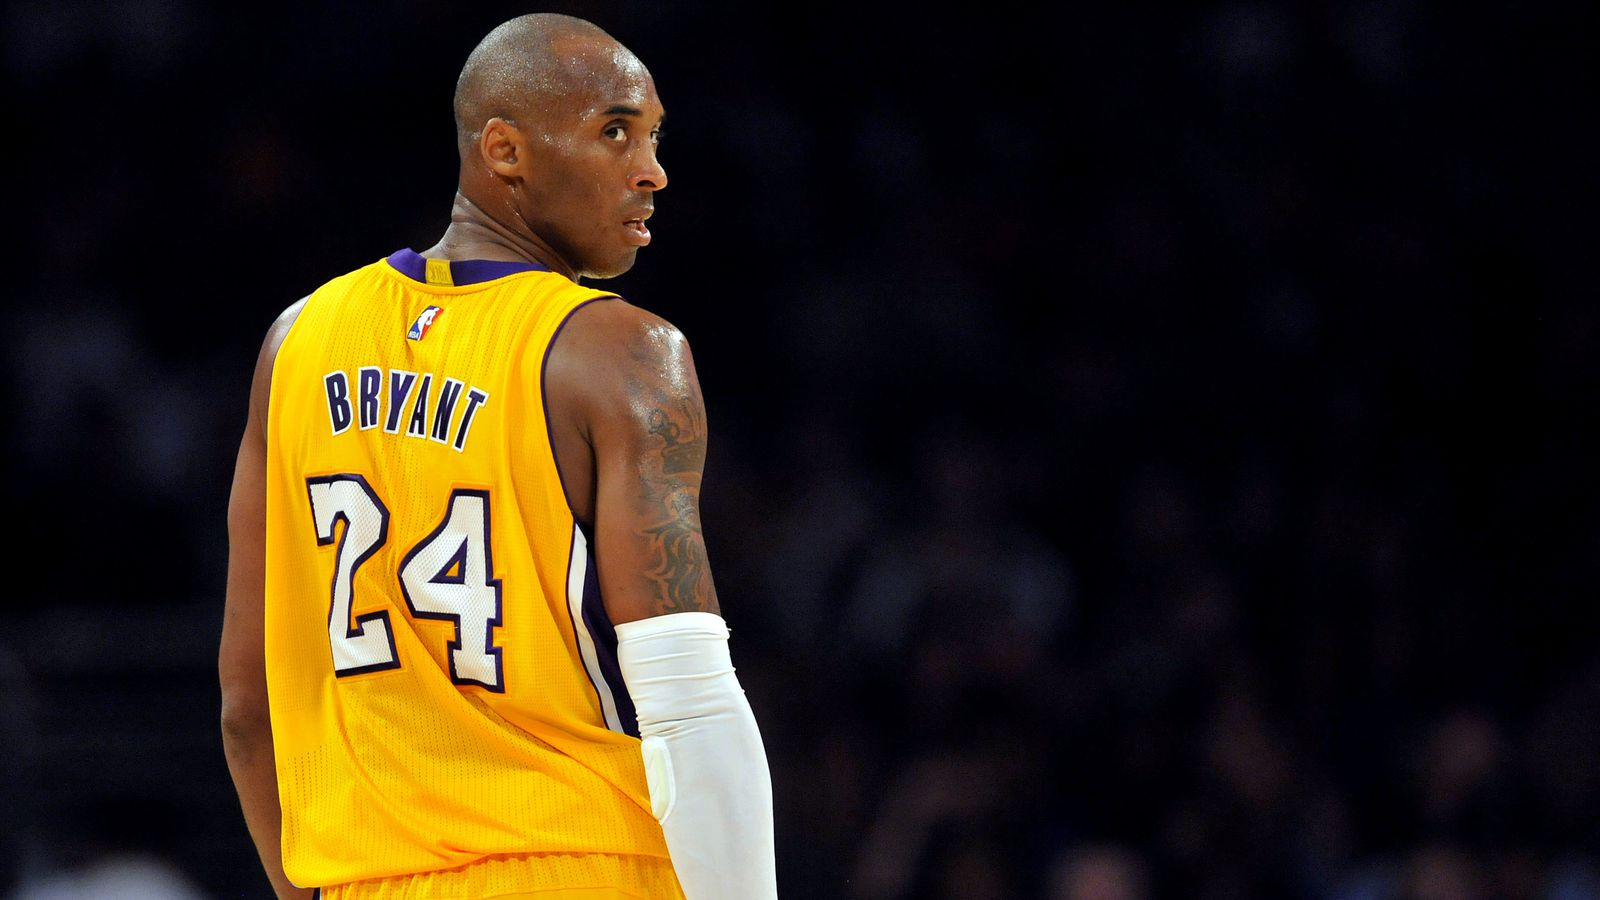 Kobe Bean Bryant ˈkoʊbi ˈbiːn ˈbɹaɪənt 23 August 1978 in Philadelphia Pennsylvania ist ein ehemaliger USamerikanischer Basketballspieler